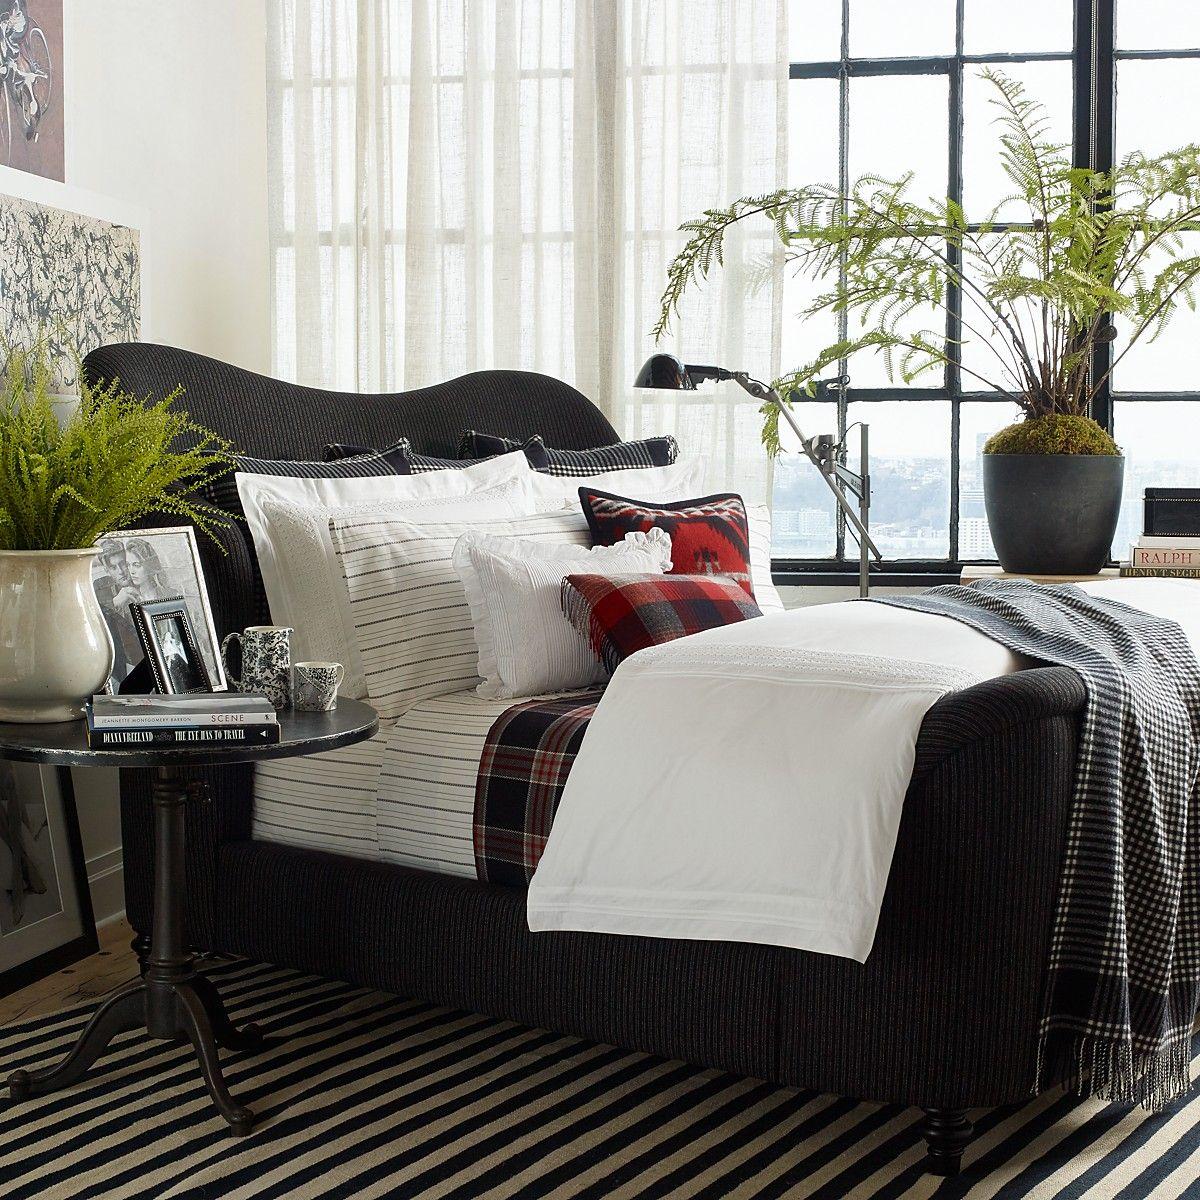 ralph lauren west village collection bloomingdale 39 s 1. Black Bedroom Furniture Sets. Home Design Ideas